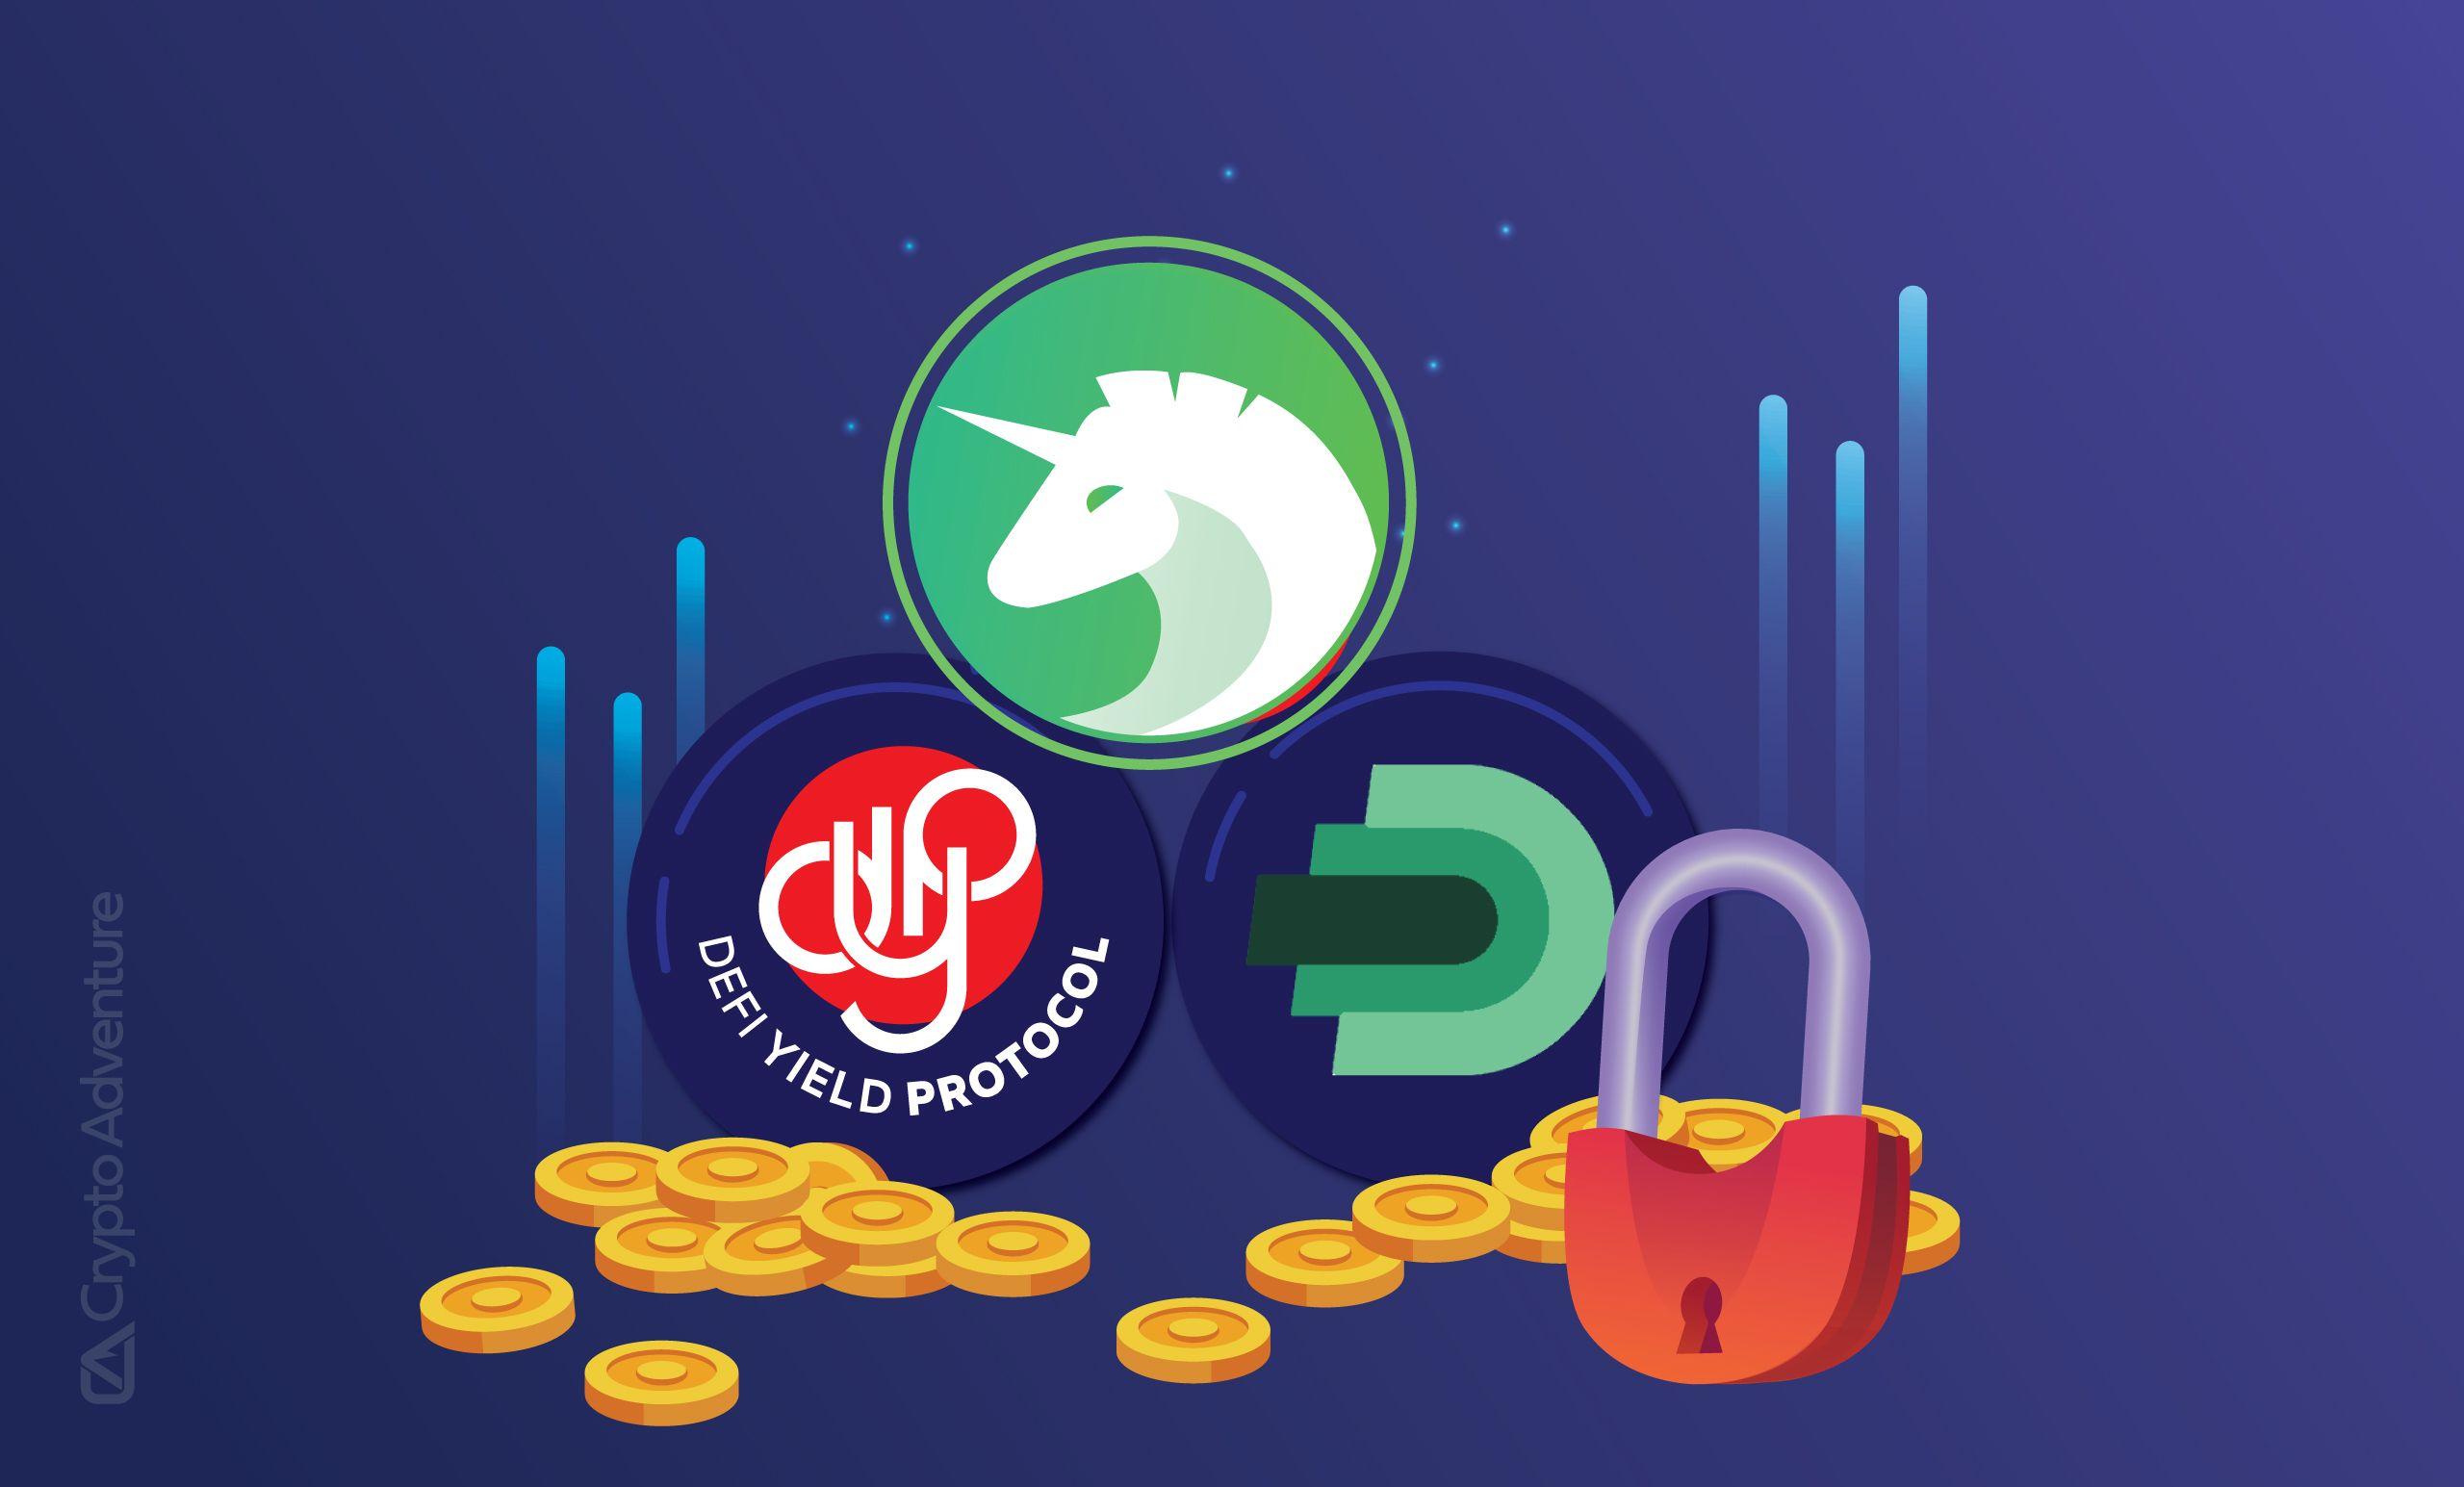 /unicrypt-vs-deeplock-vs-dyp-locker-whos-the-best-liquidity-locker-in-2021-ij54347e feature image